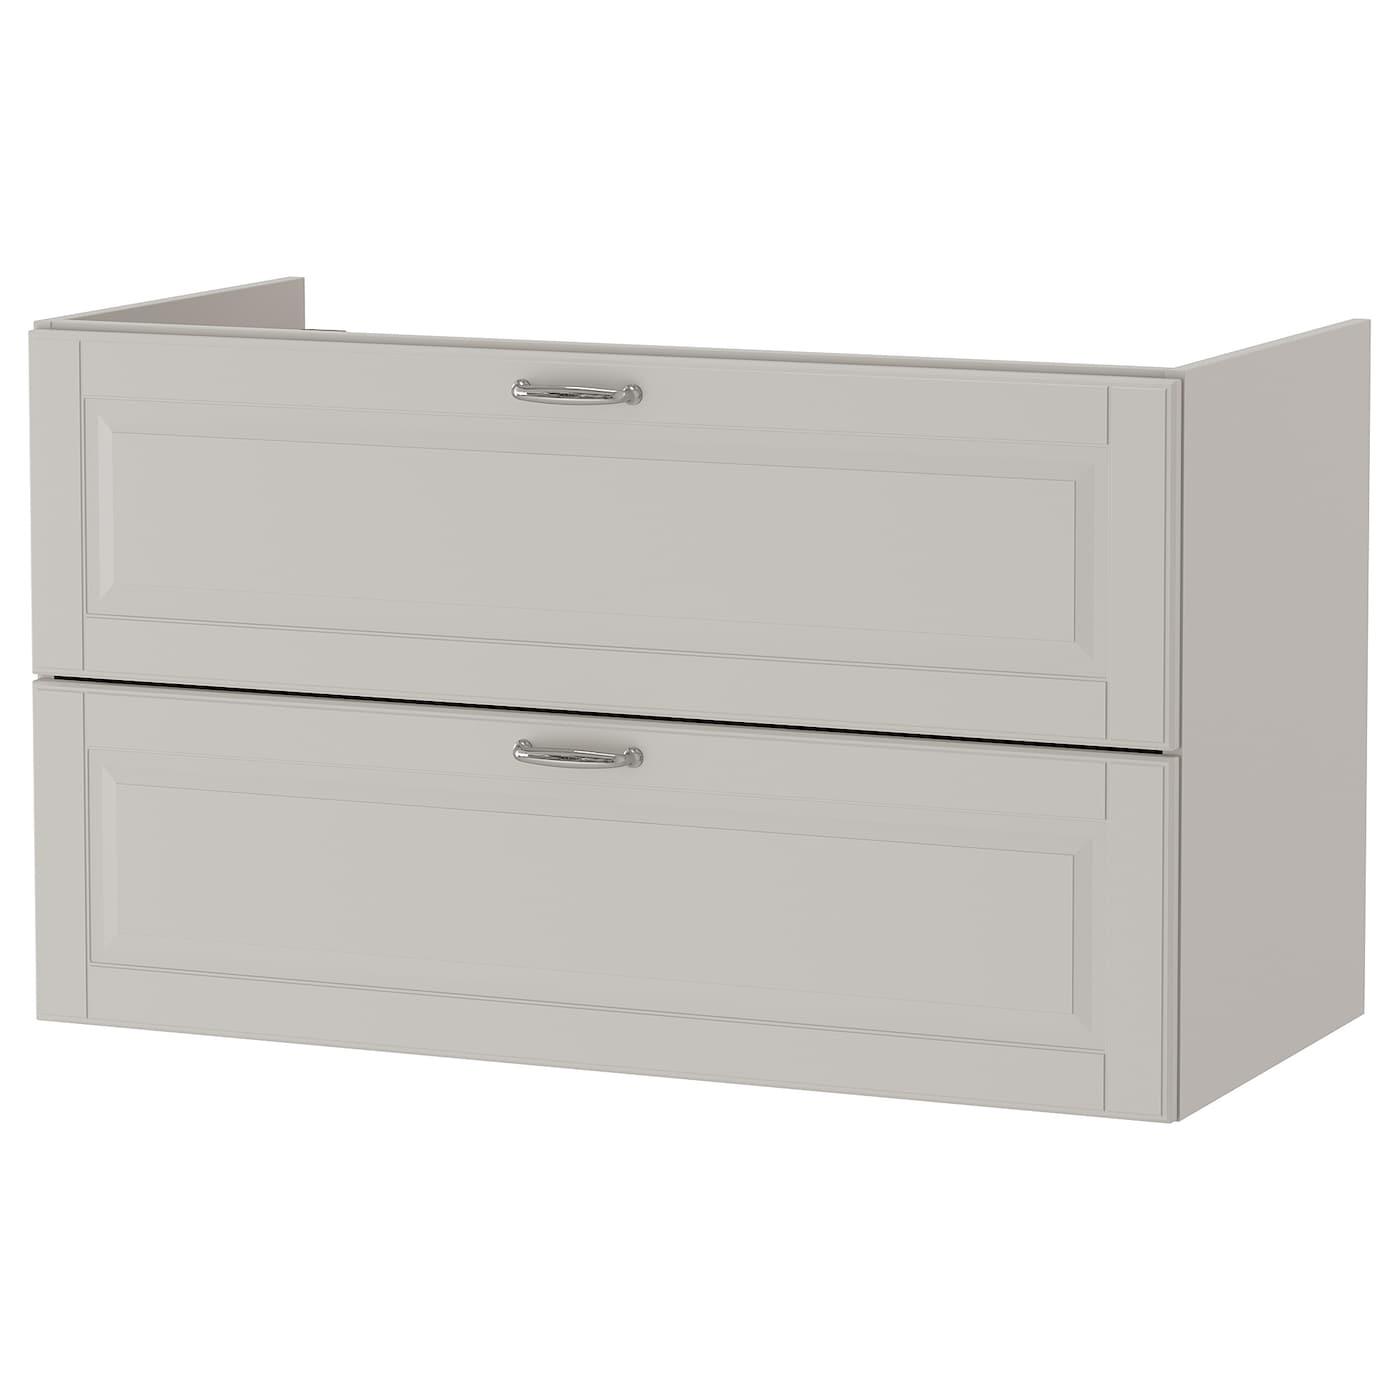 godmorgon kast voor wastafel met 2 lades kasj n lichtgrijs 100x47x58 cm ikea. Black Bedroom Furniture Sets. Home Design Ideas